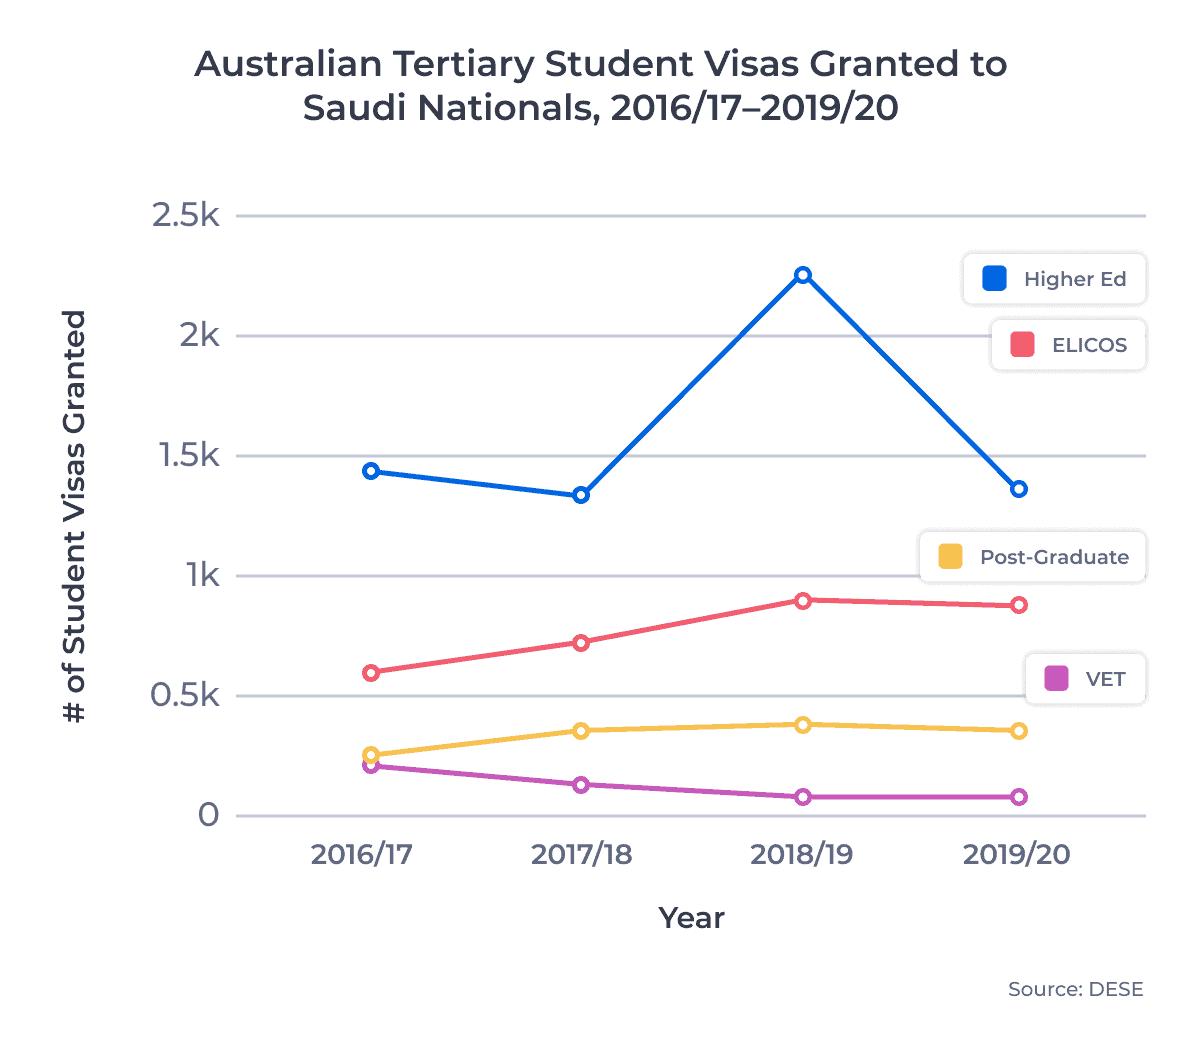 Australian Tertiary Student Visas Granted to Saudi Nationals, 2016/17-2019/20